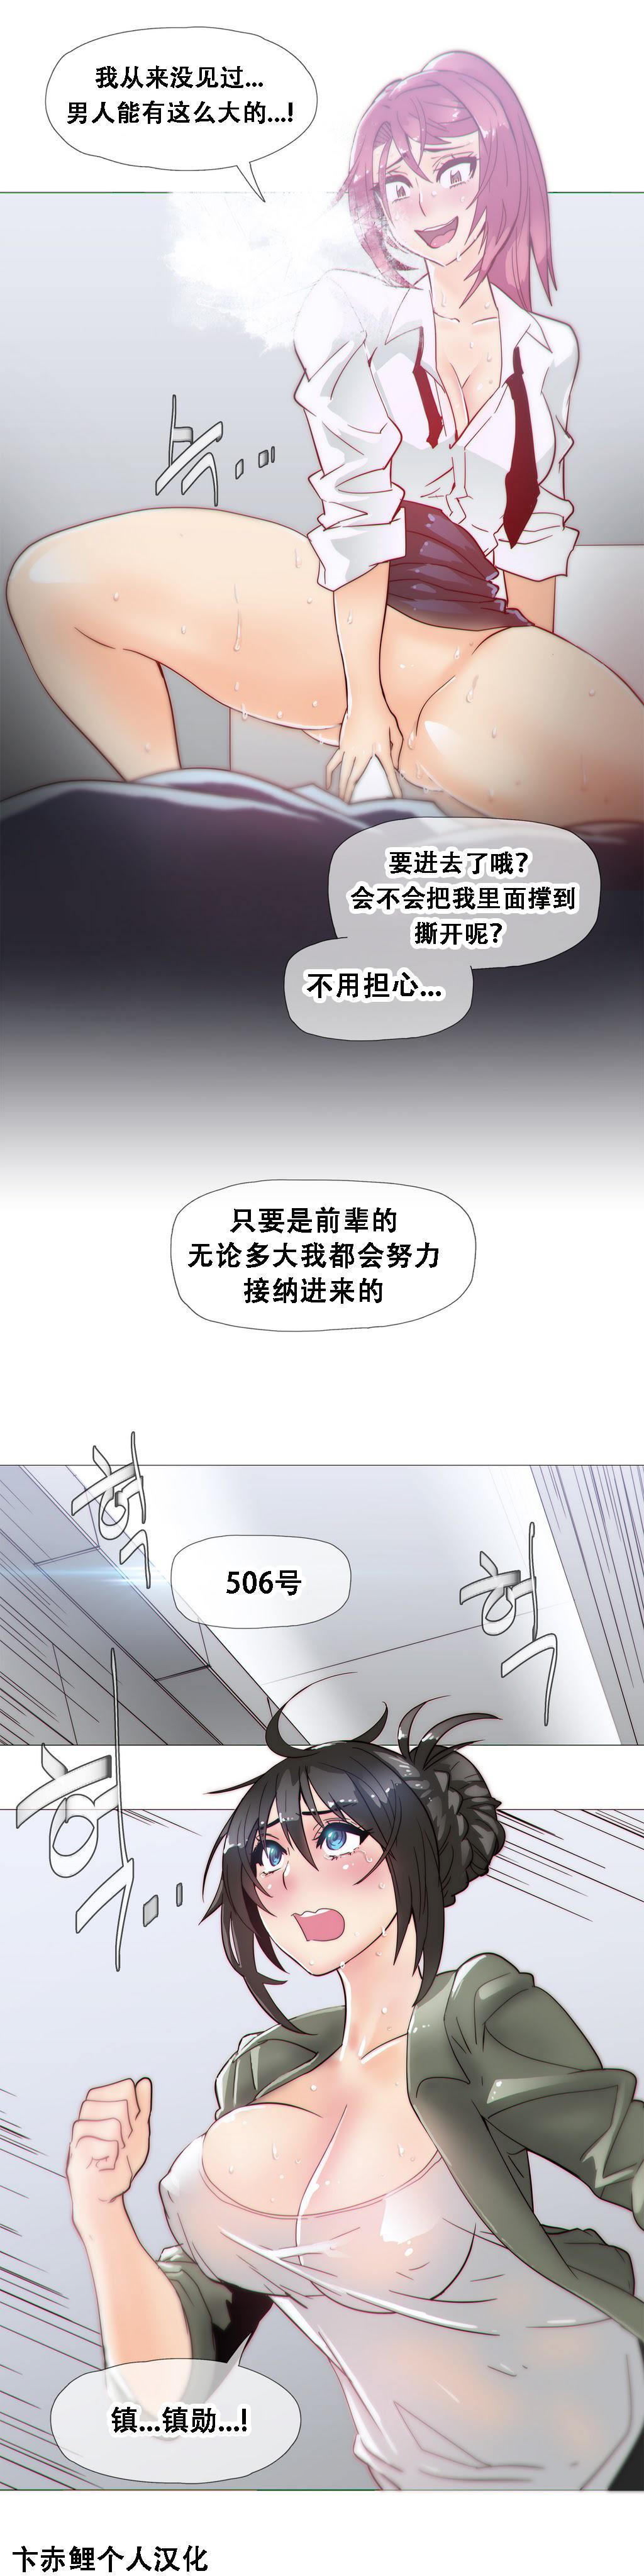 HouseHold Affairs 【卞赤鲤个人汉化】1~21话(持续更新中) 424